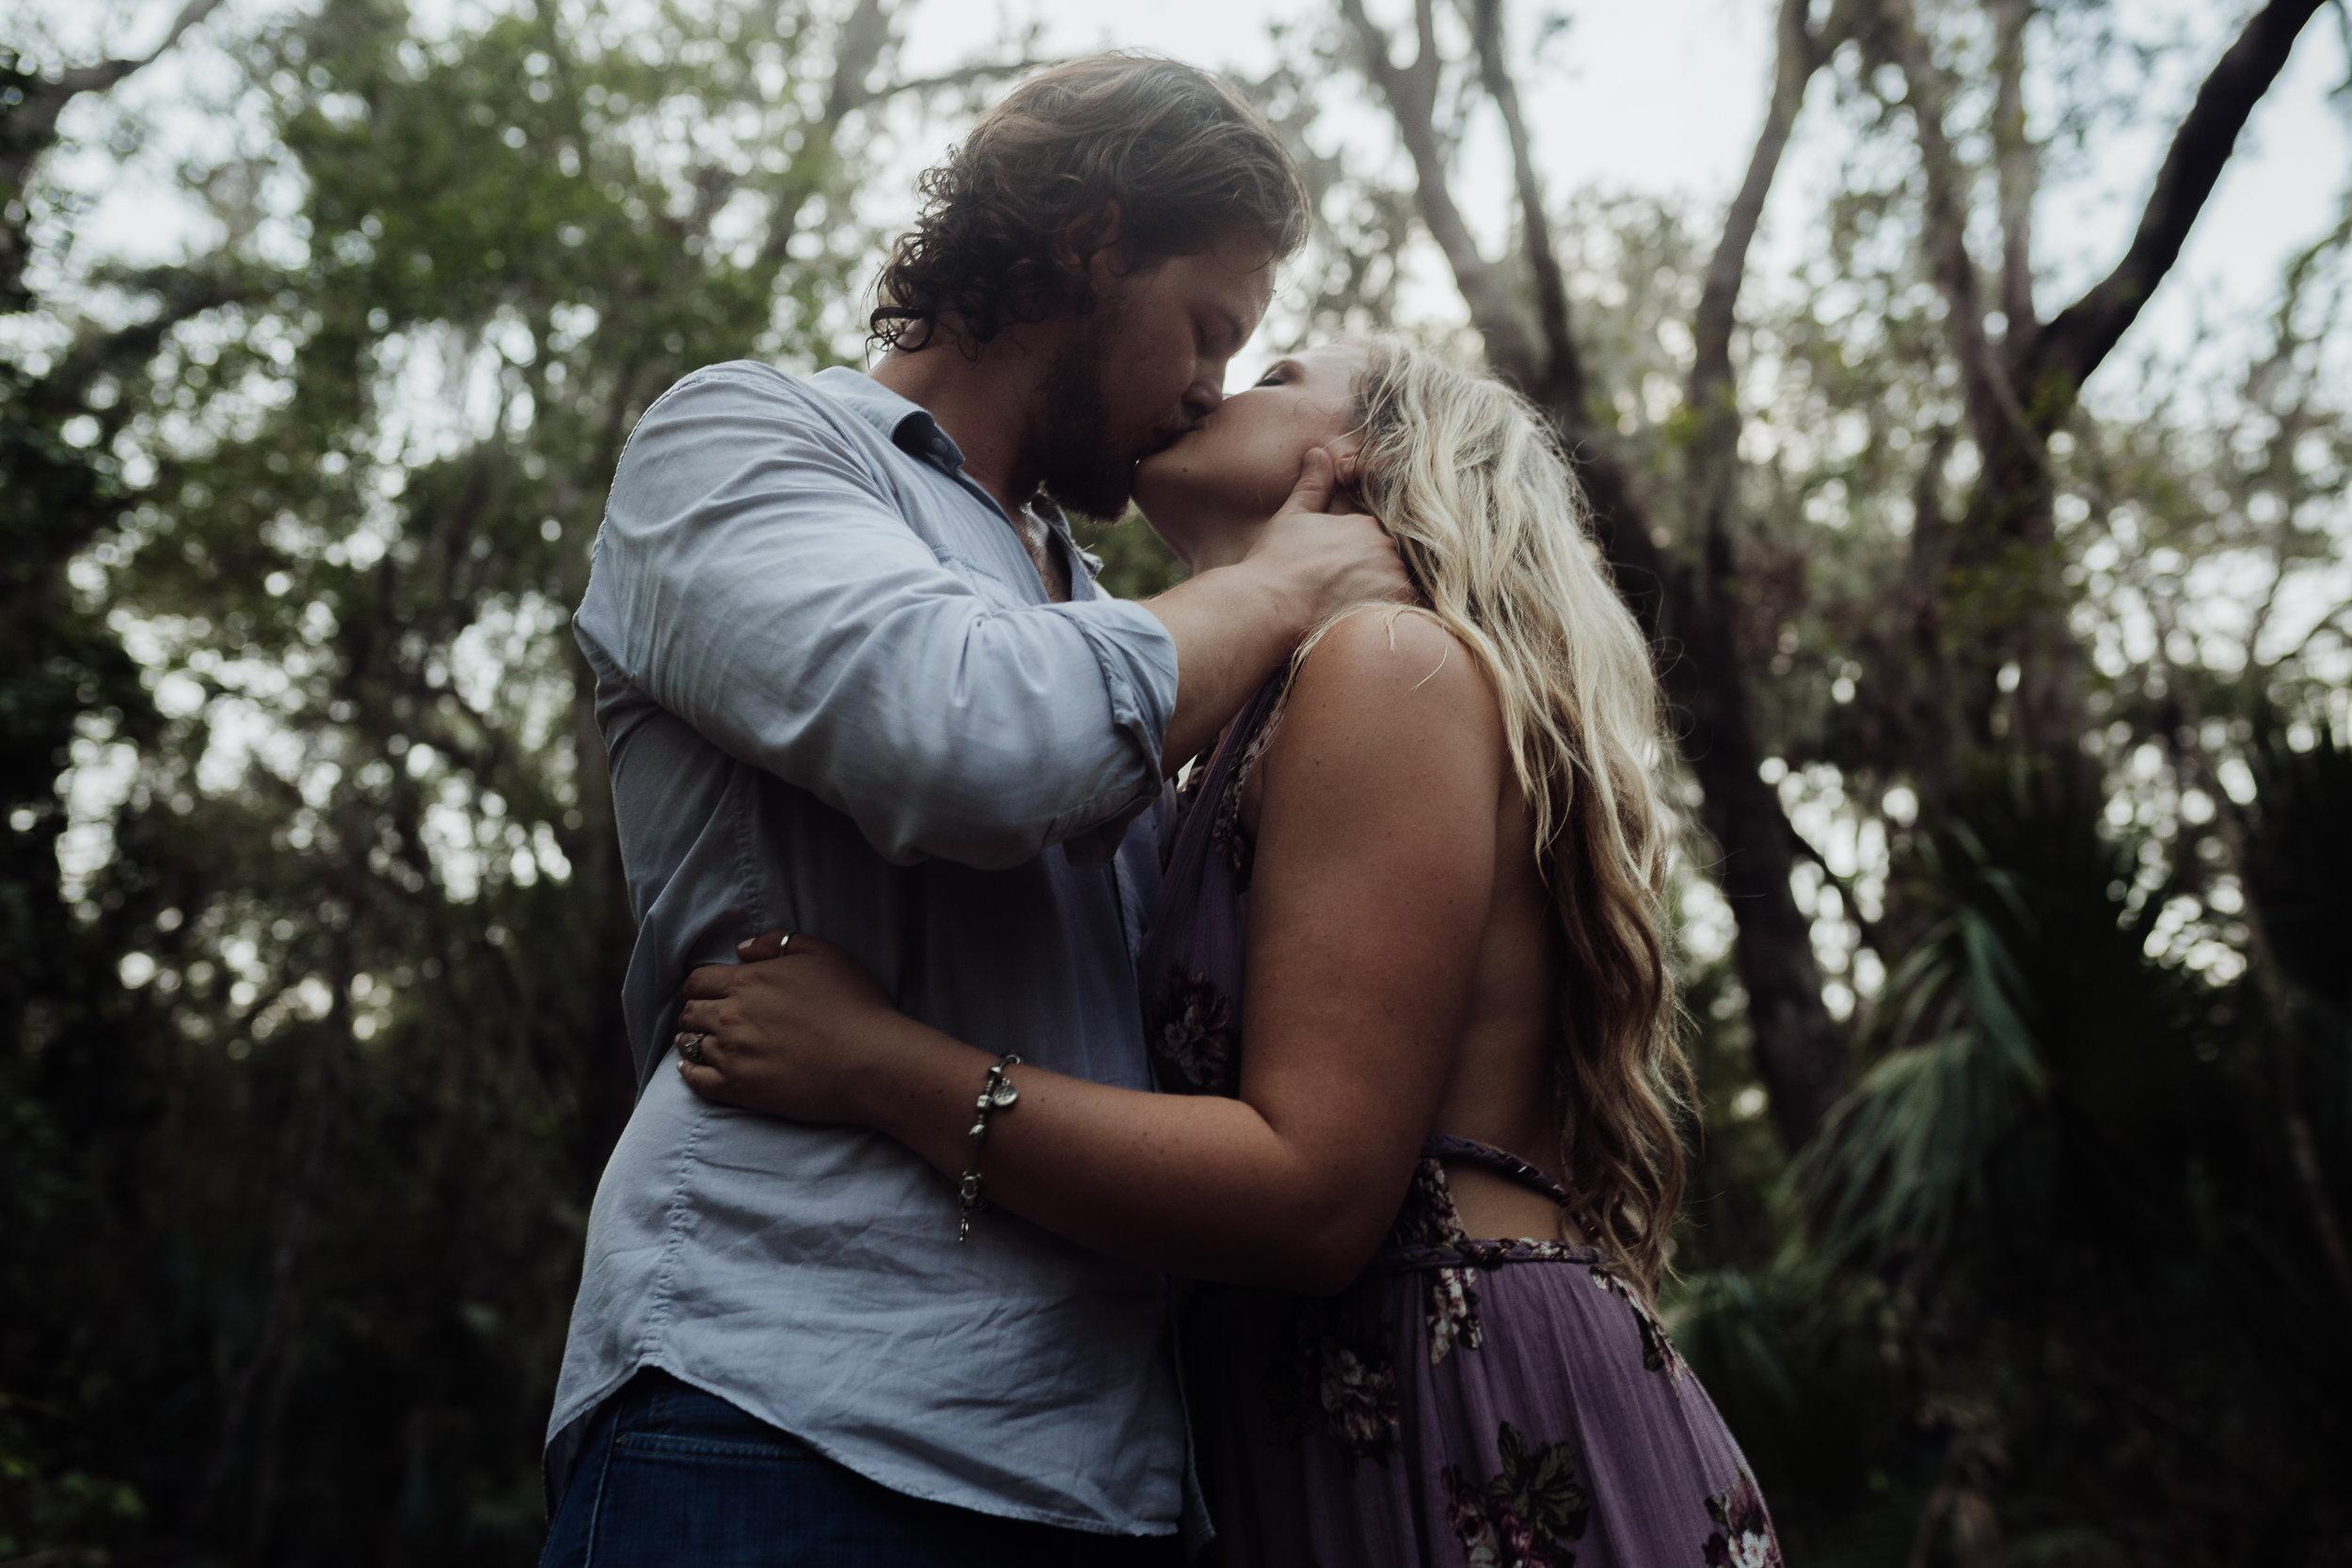 Central Florida Engagement photographer for Orlando, Daytona Beach, and Deland